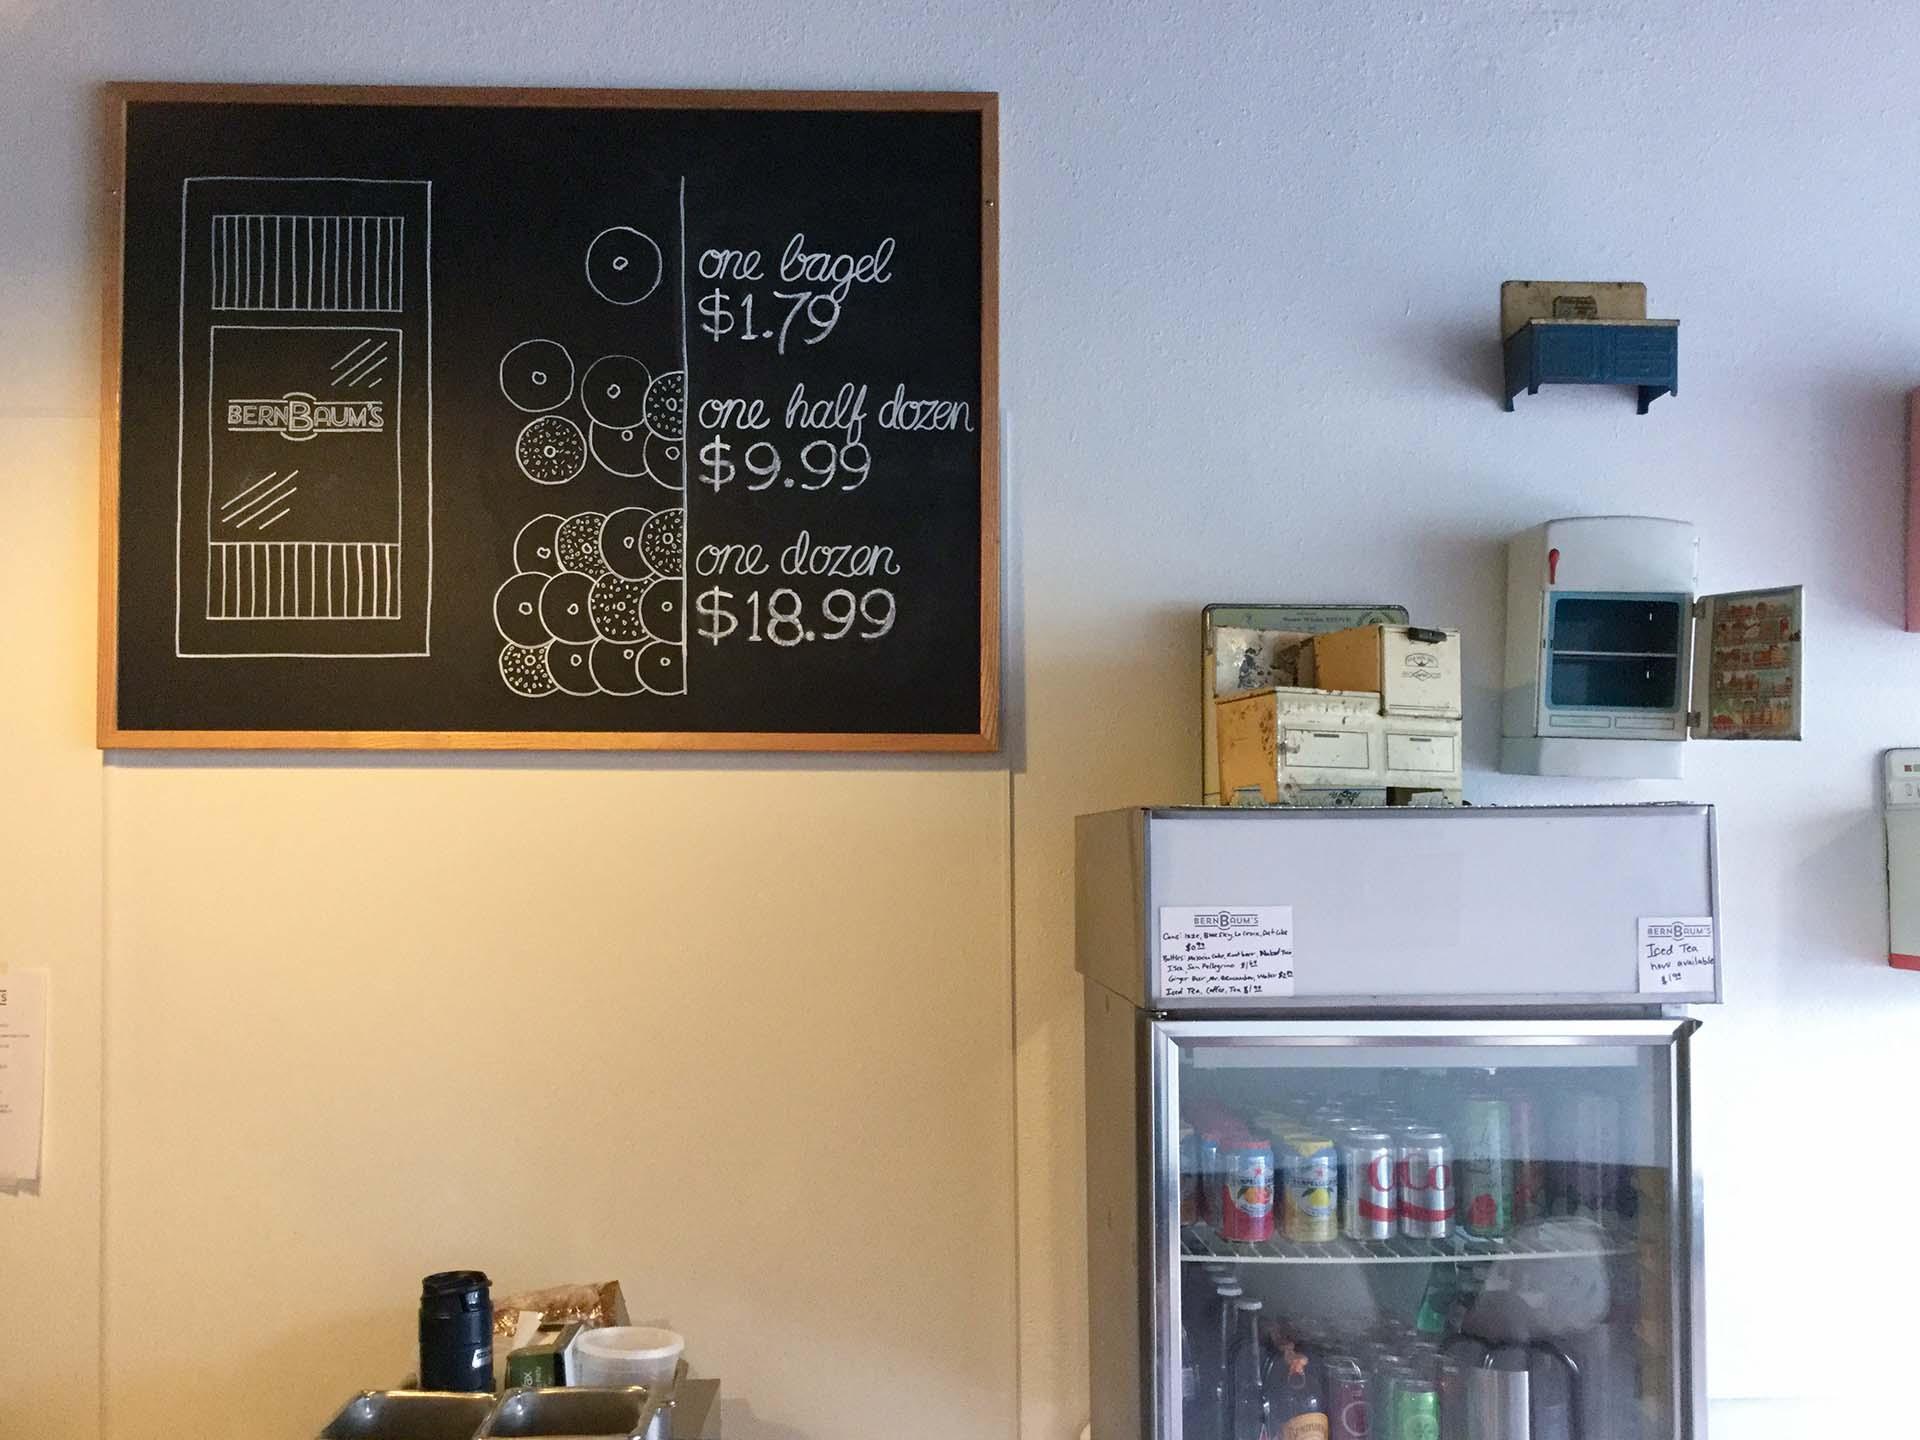 Pricing chalkboard on display in BernBaum's near refrigerator